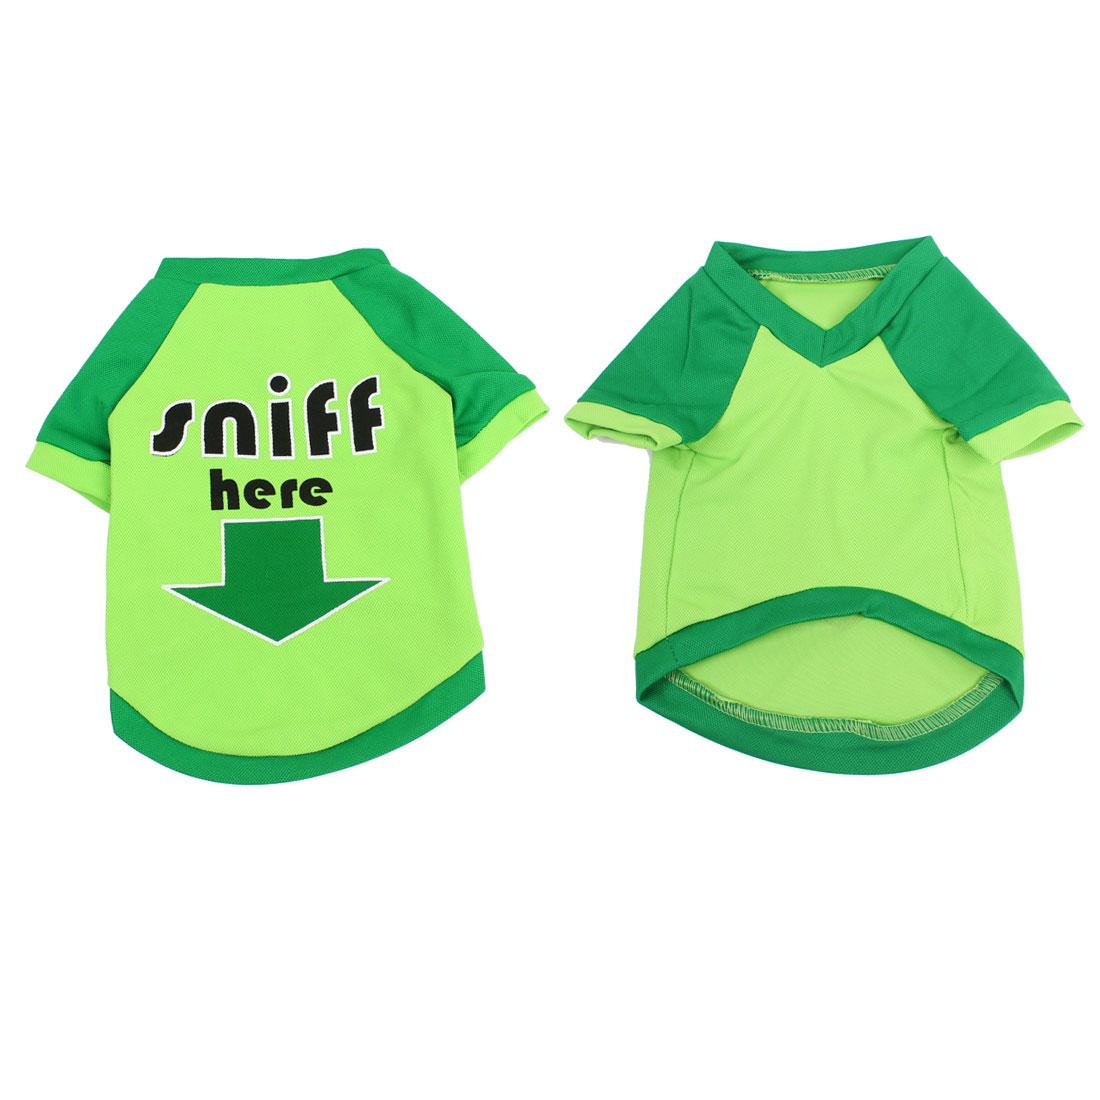 Arrow Pattern Dog Chihuaha Summer Short Sleeves Tee Shirt Clothes Green M